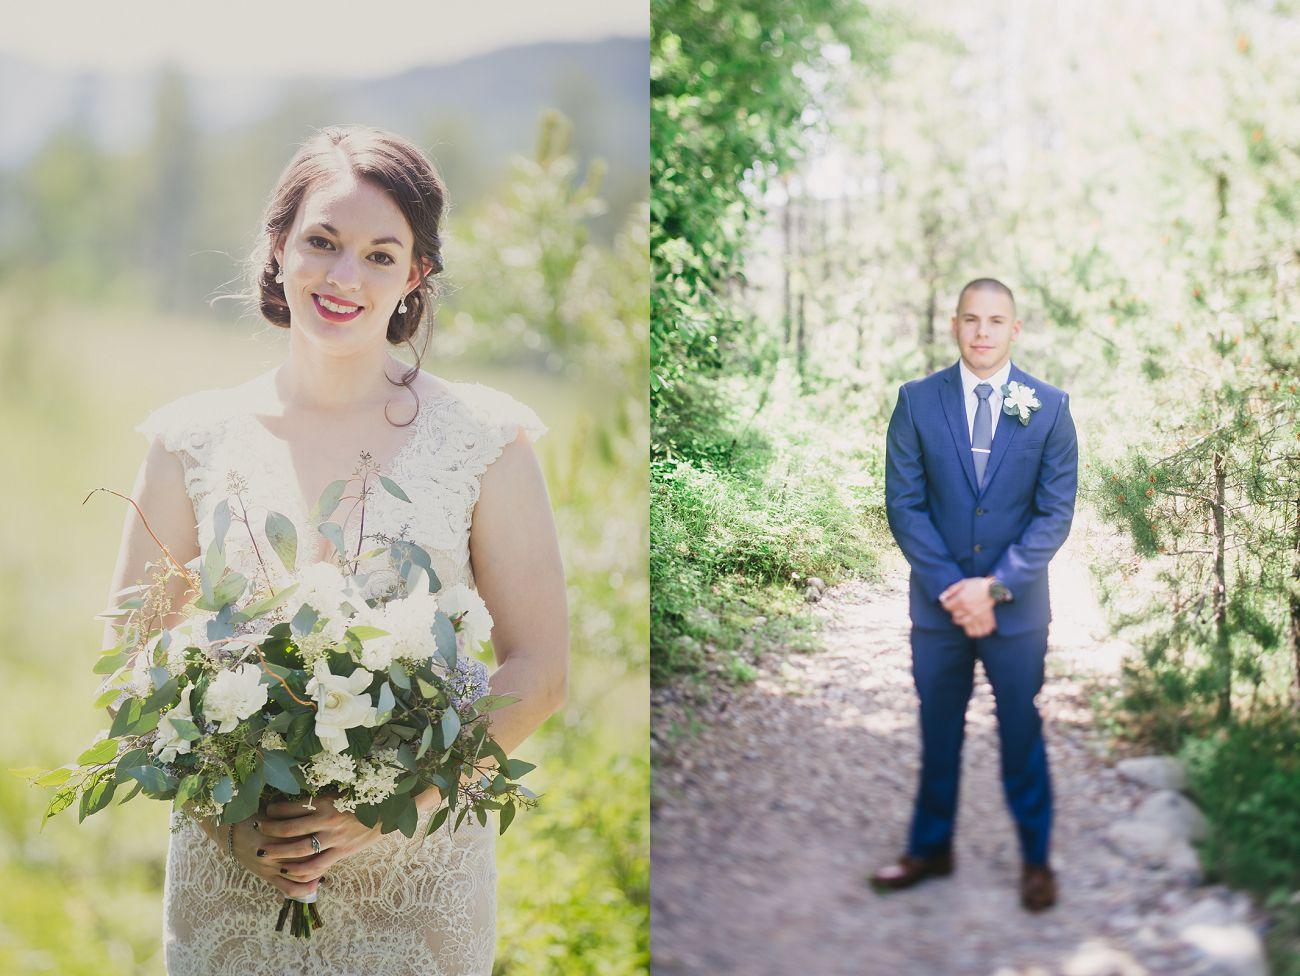 Jennifer_Mooney_Photo_Glacier_Park_Weddings_Elopement_00038.jpg